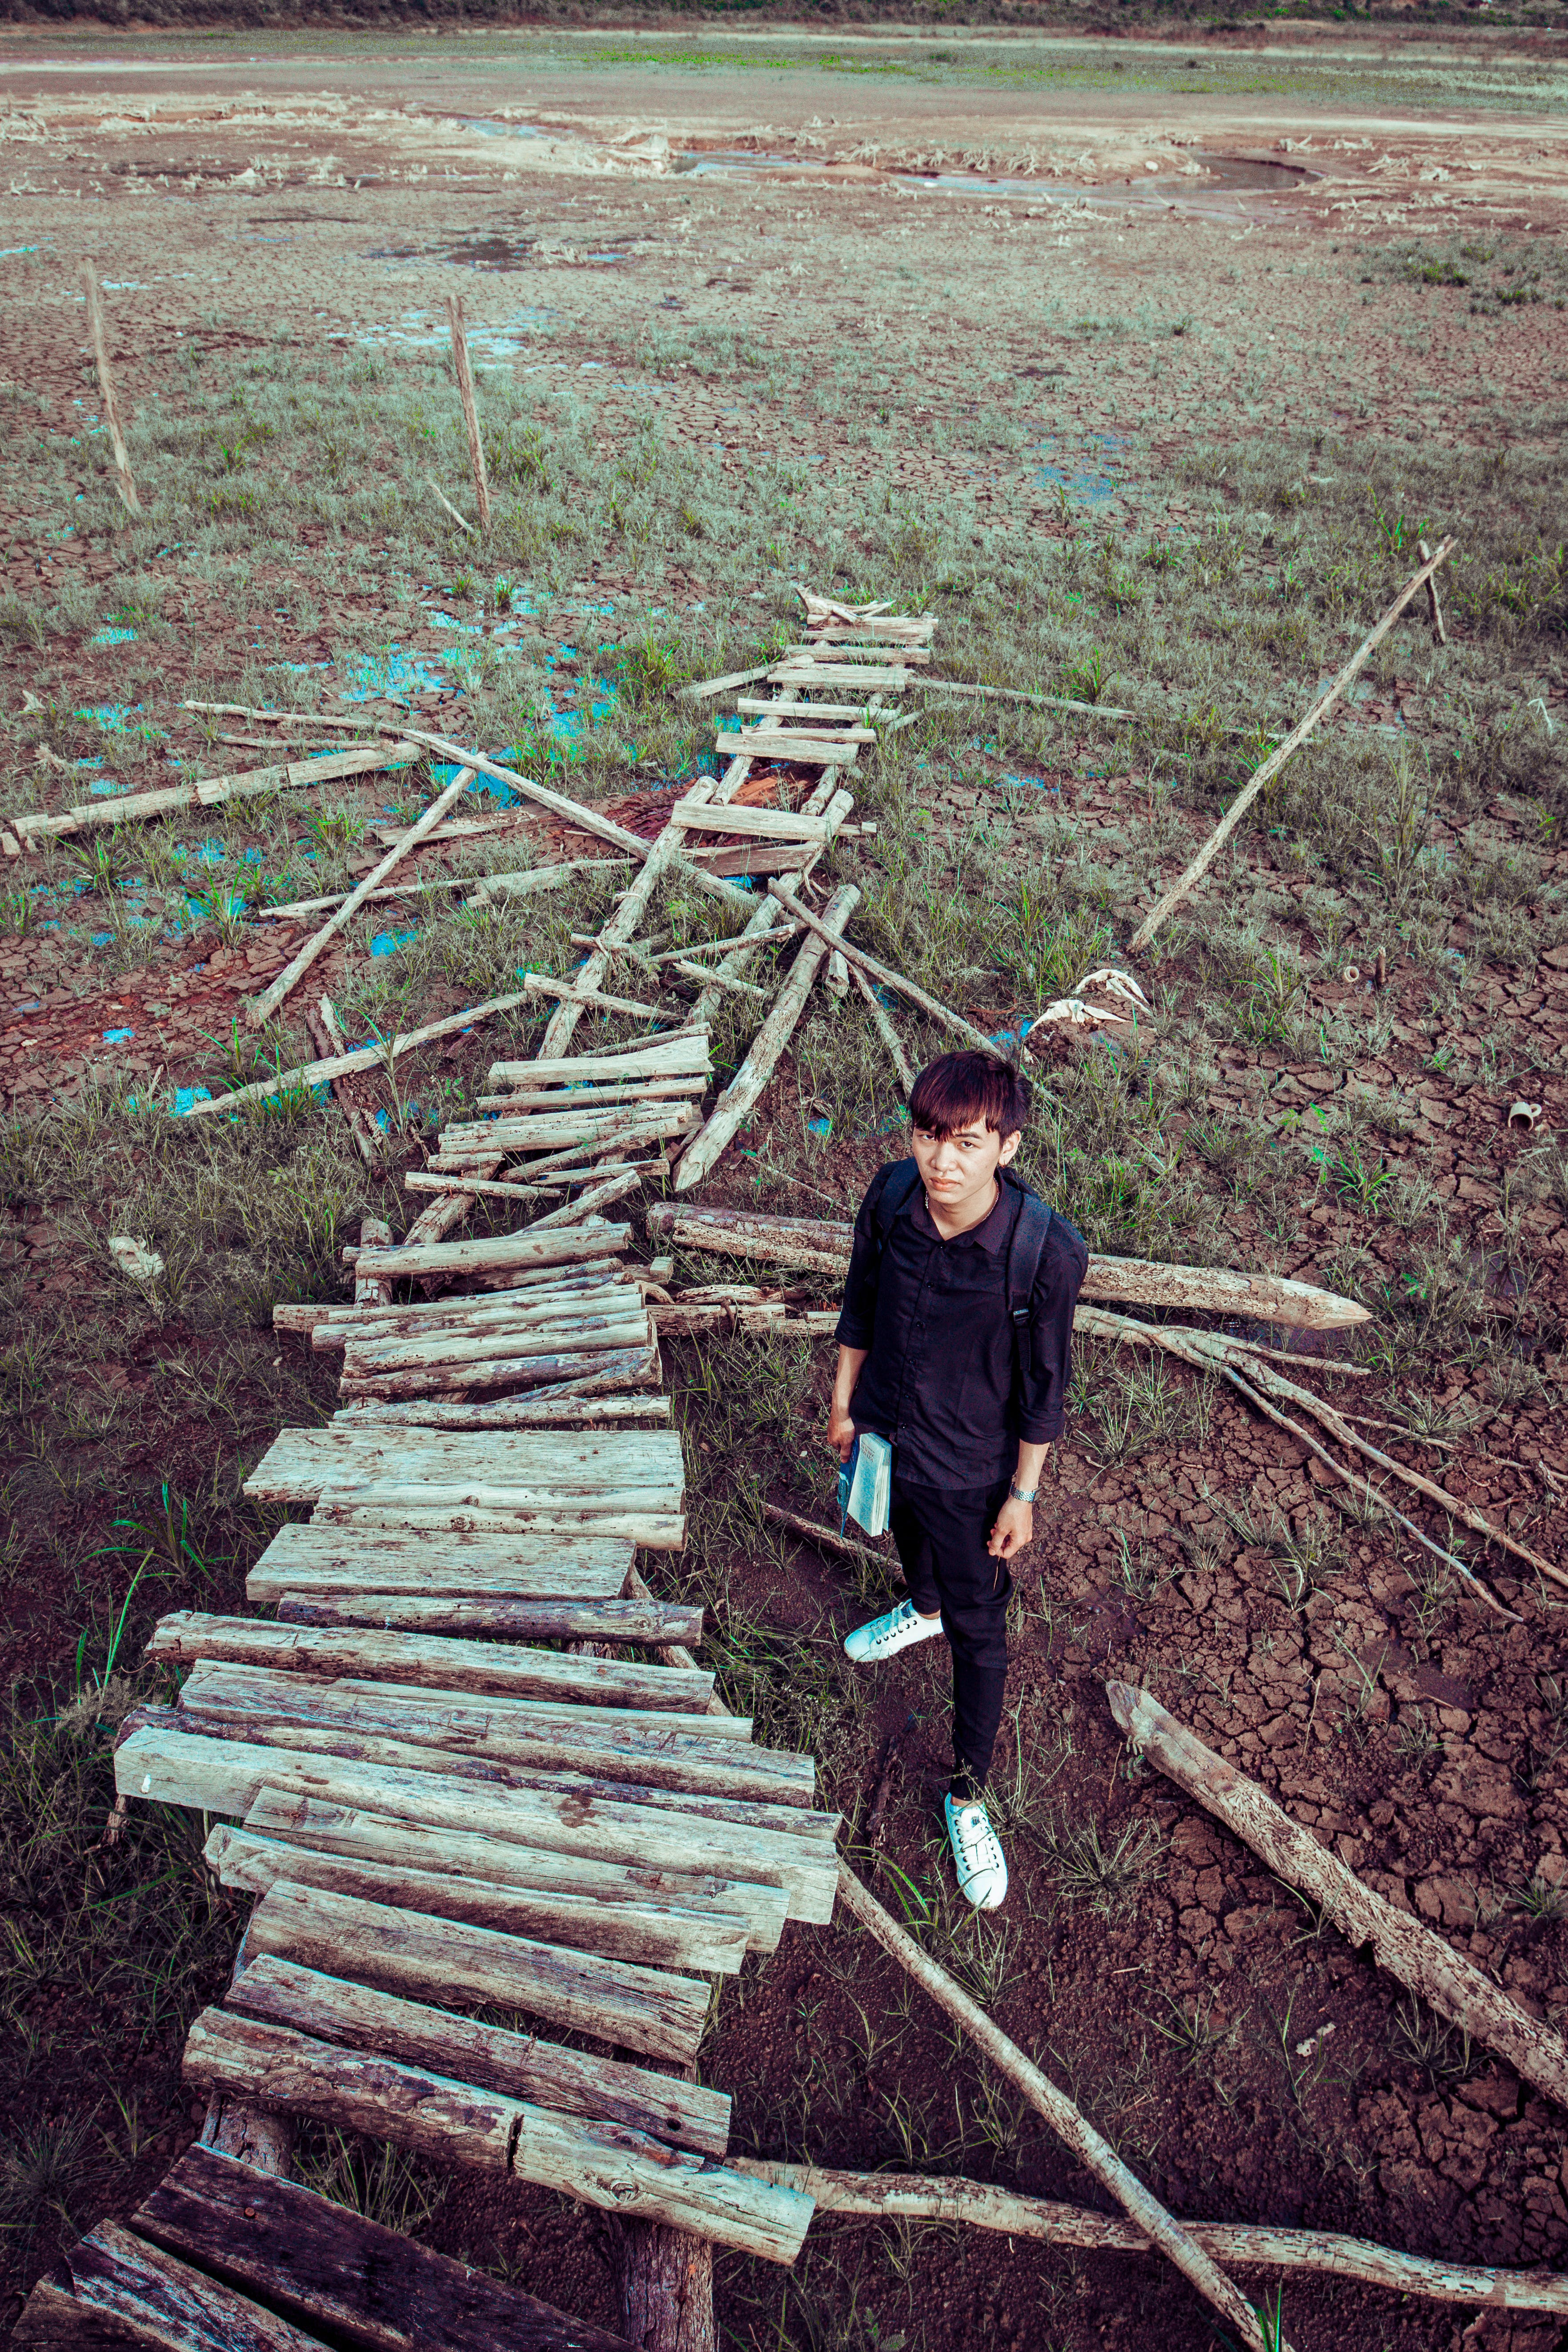 Free stock photo of man, field, bridge, travel